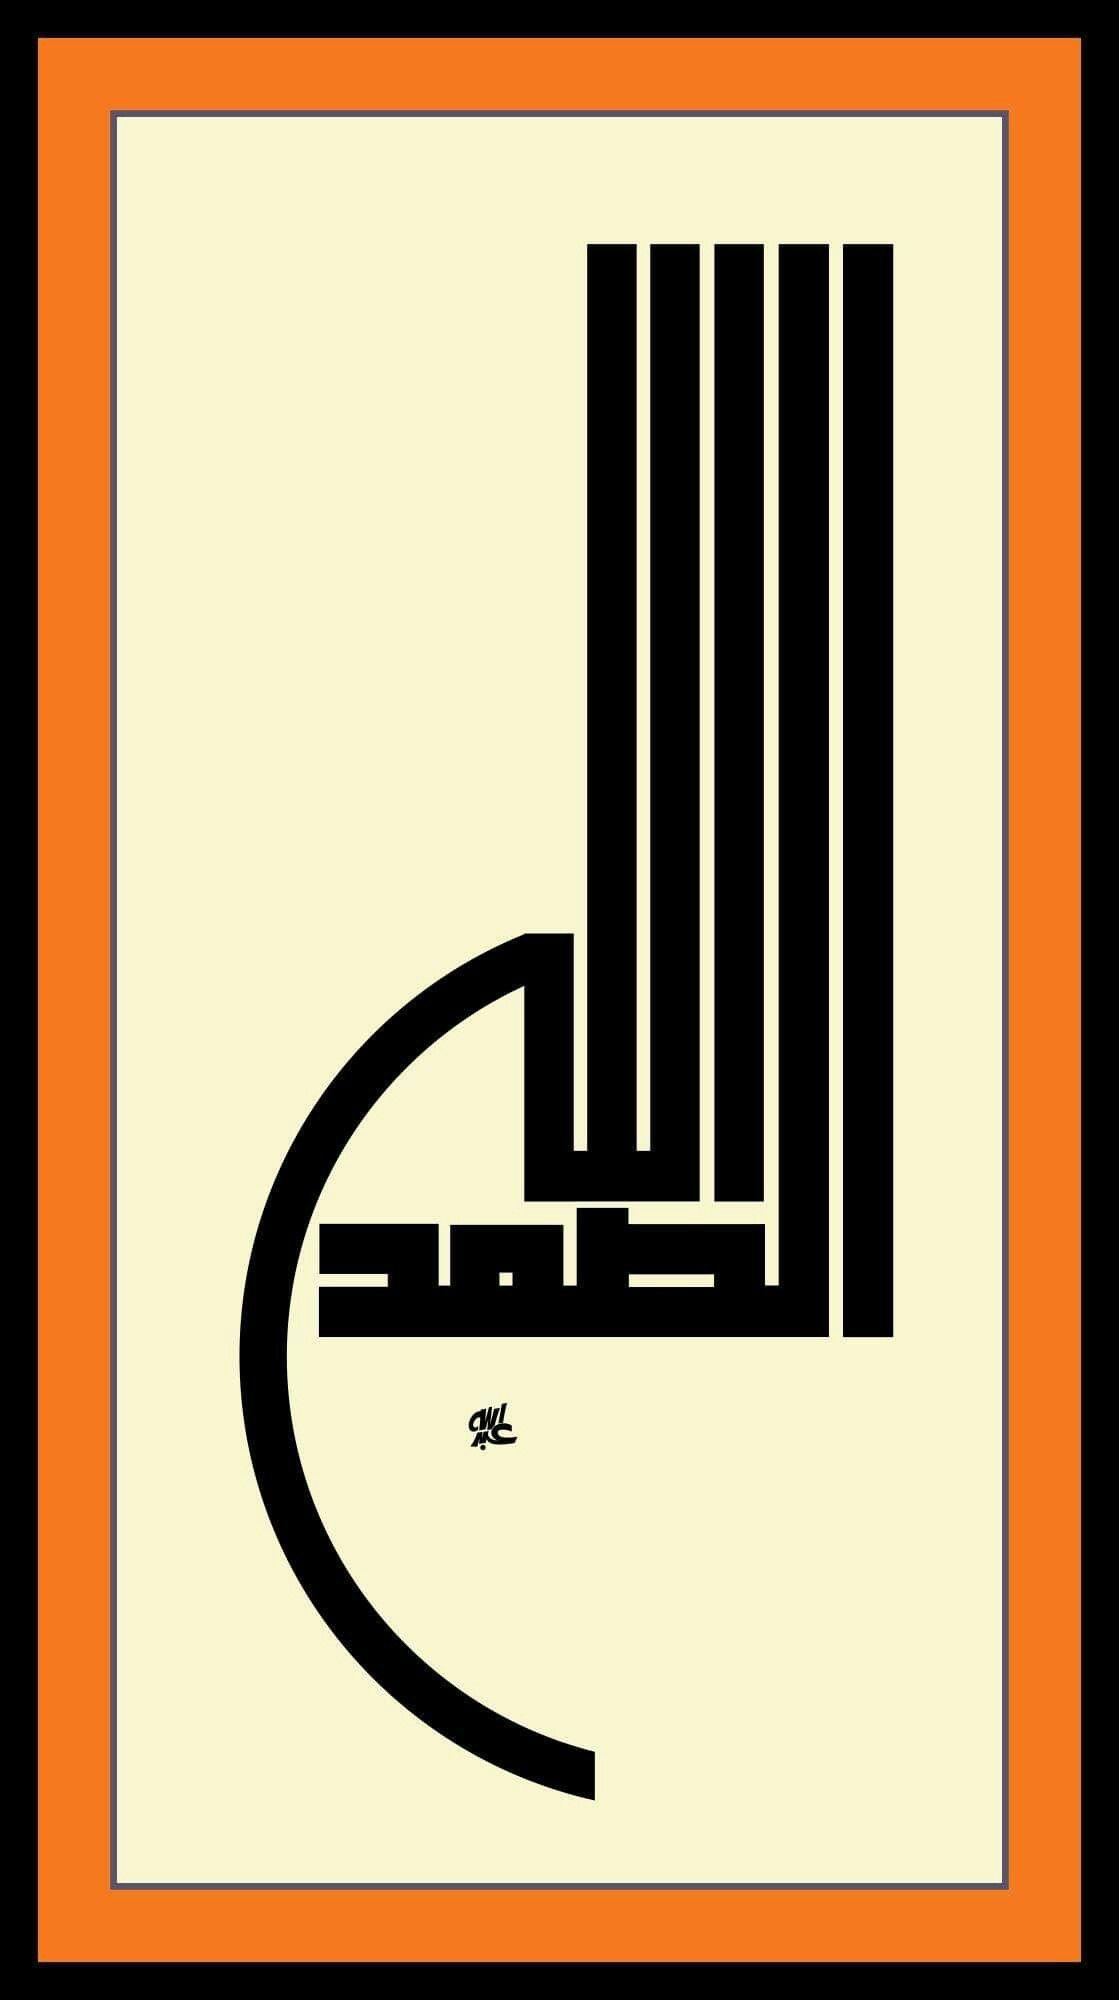 الحمد لله على كل حال Islamic Art Calligraphy Arabic Calligraphy Painting Islamic Calligraphy